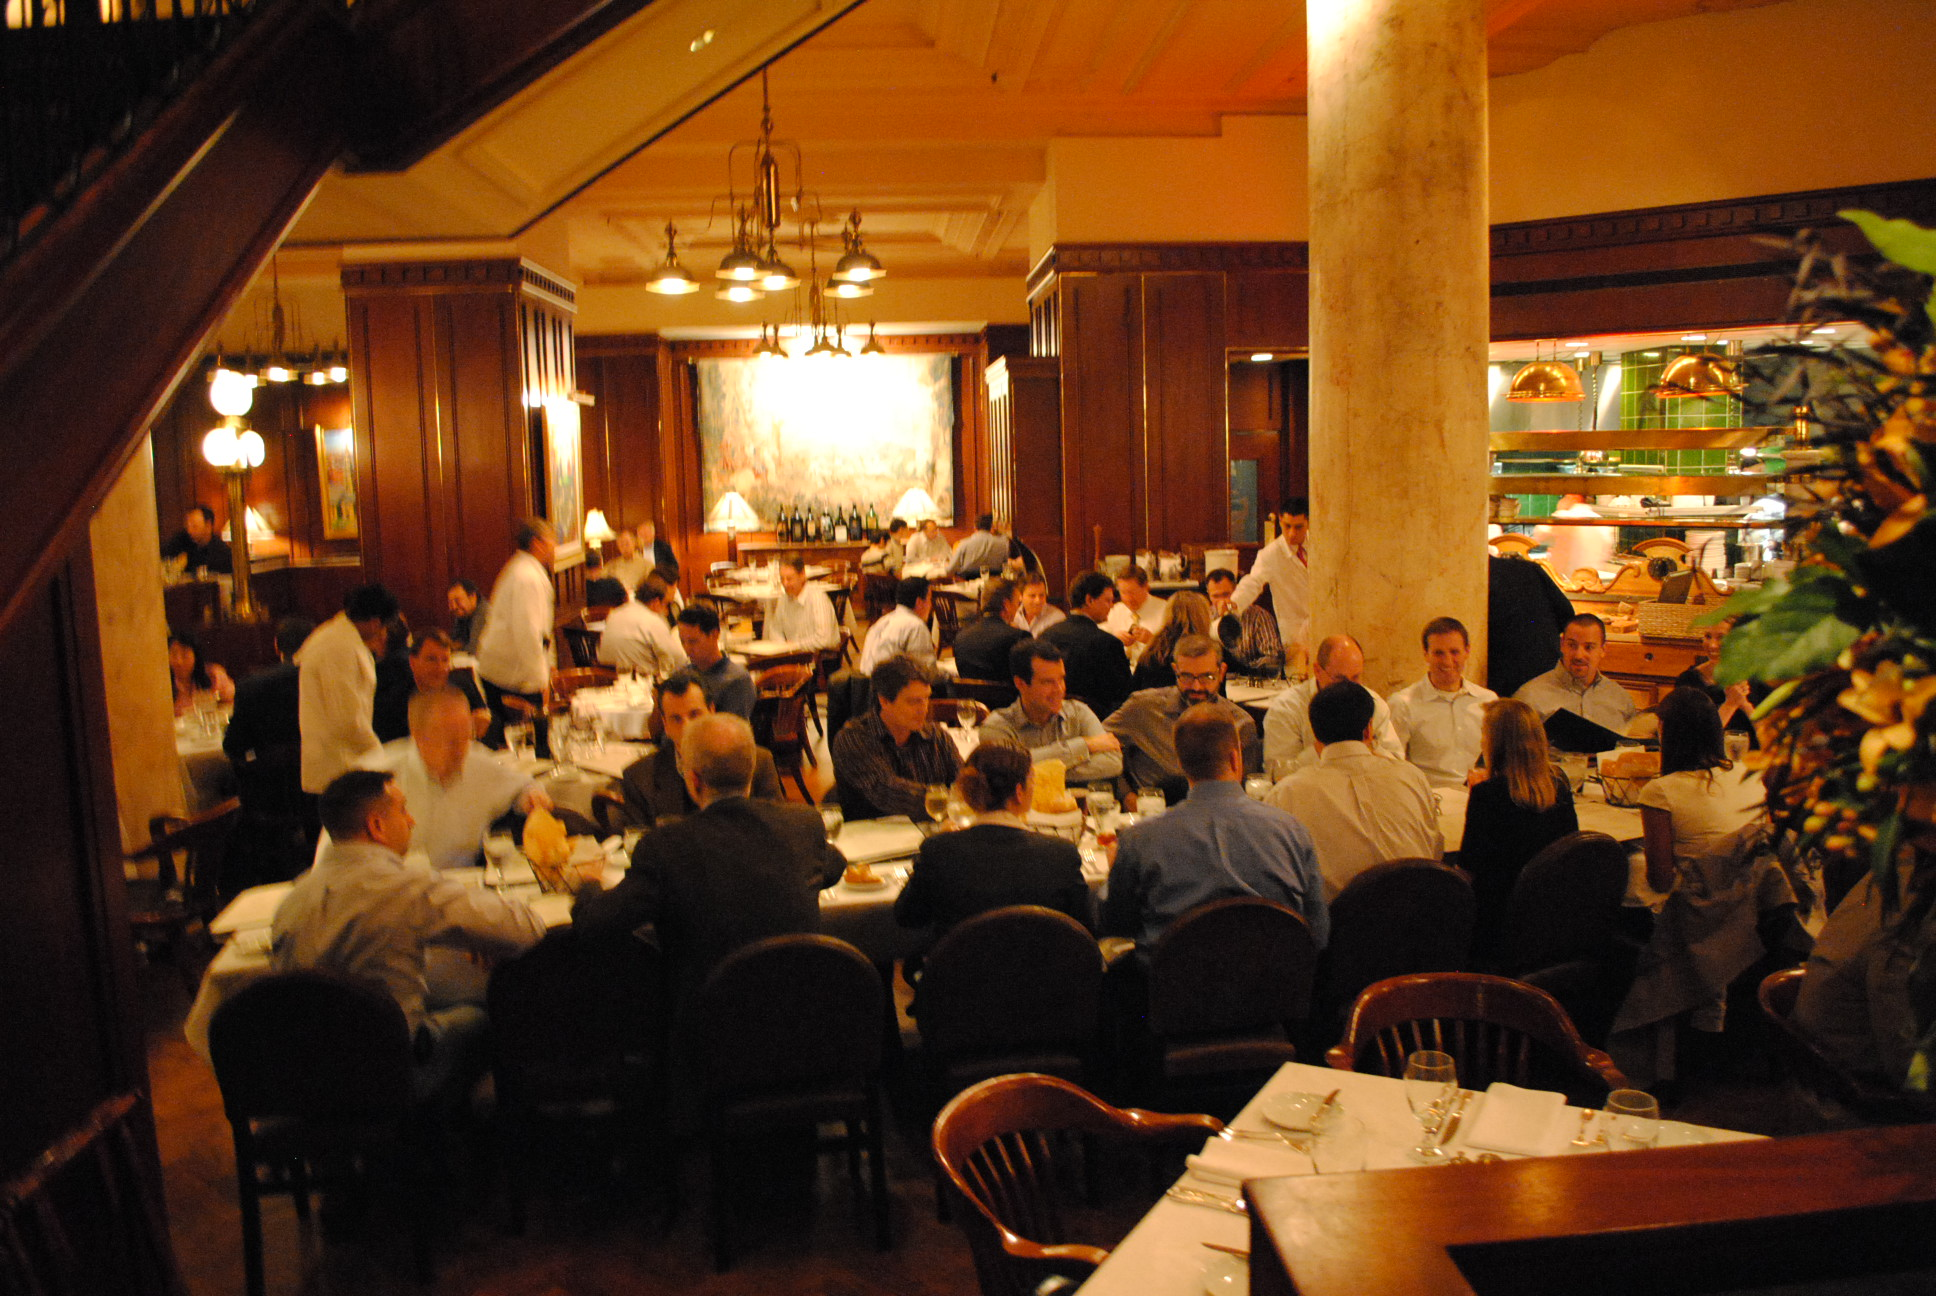 Post-meeting group dinner in Boston